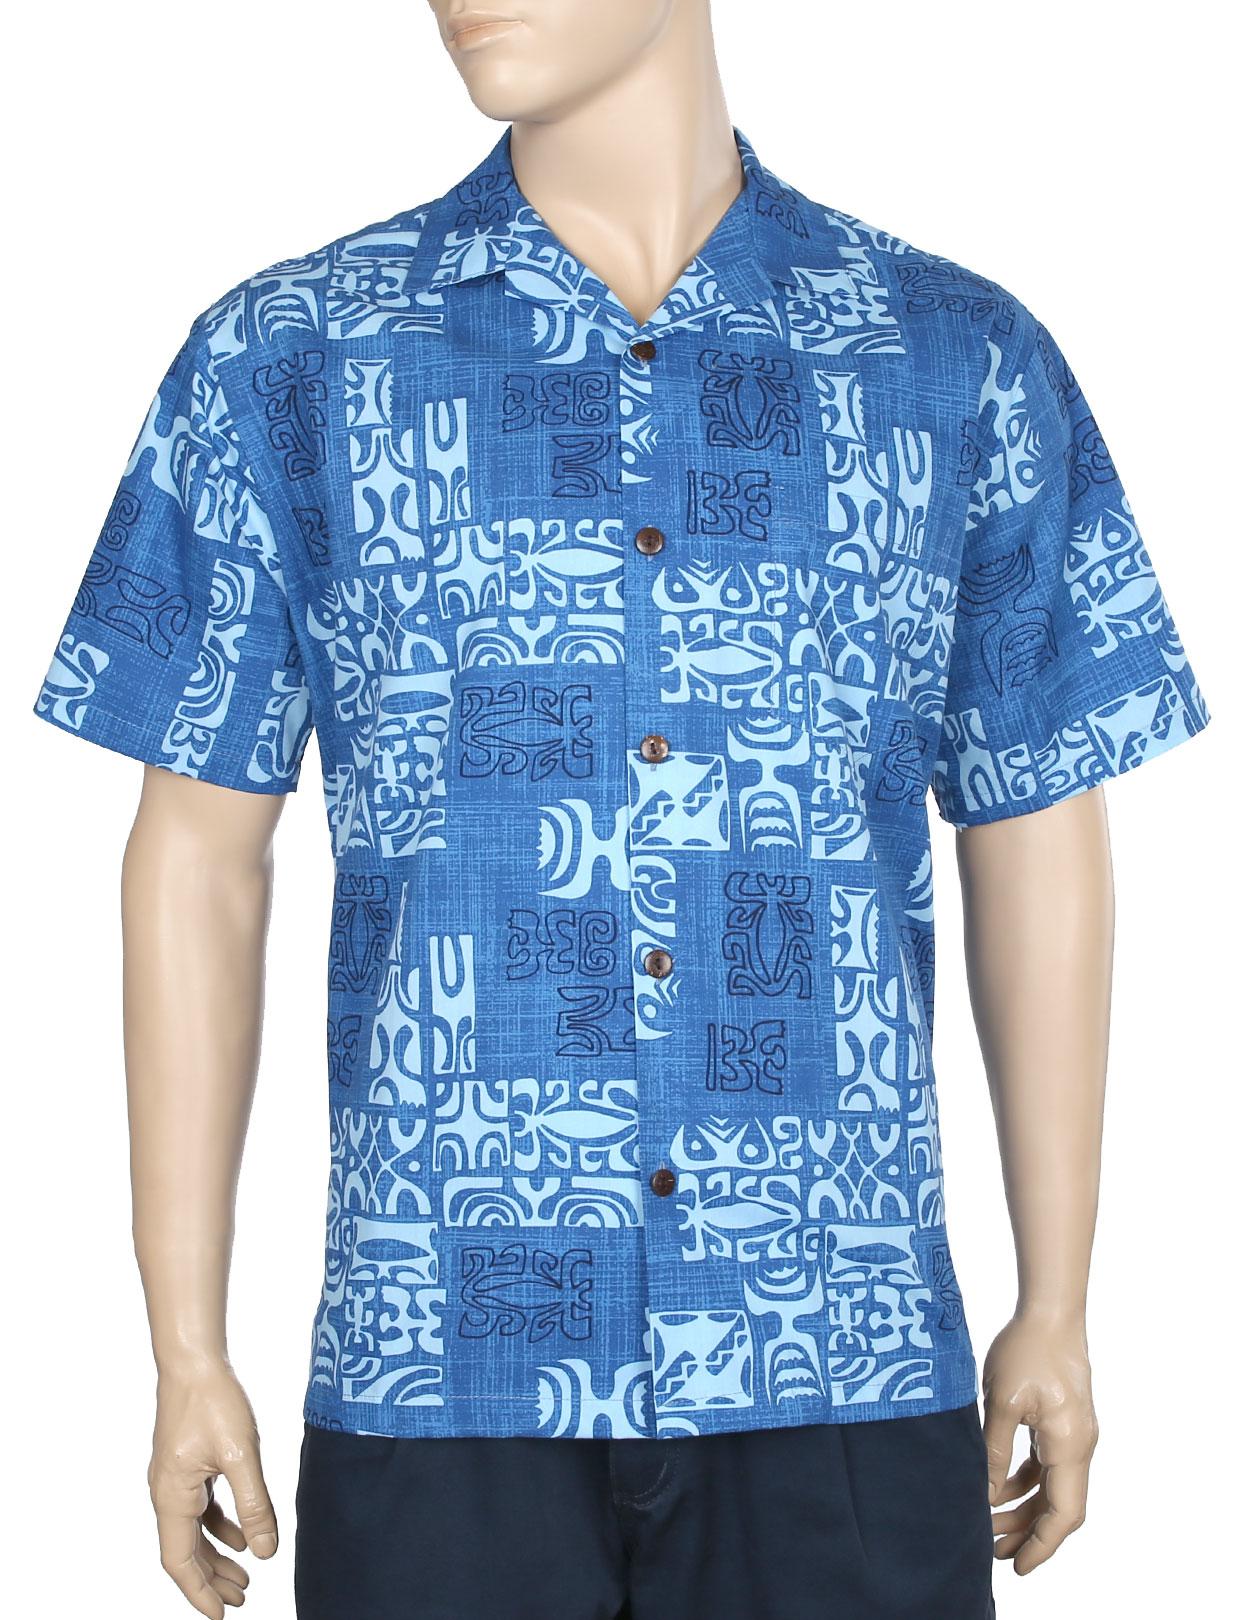 Plus Size Hawaiian Shirts and Clothing - Shaka Time Hawaii